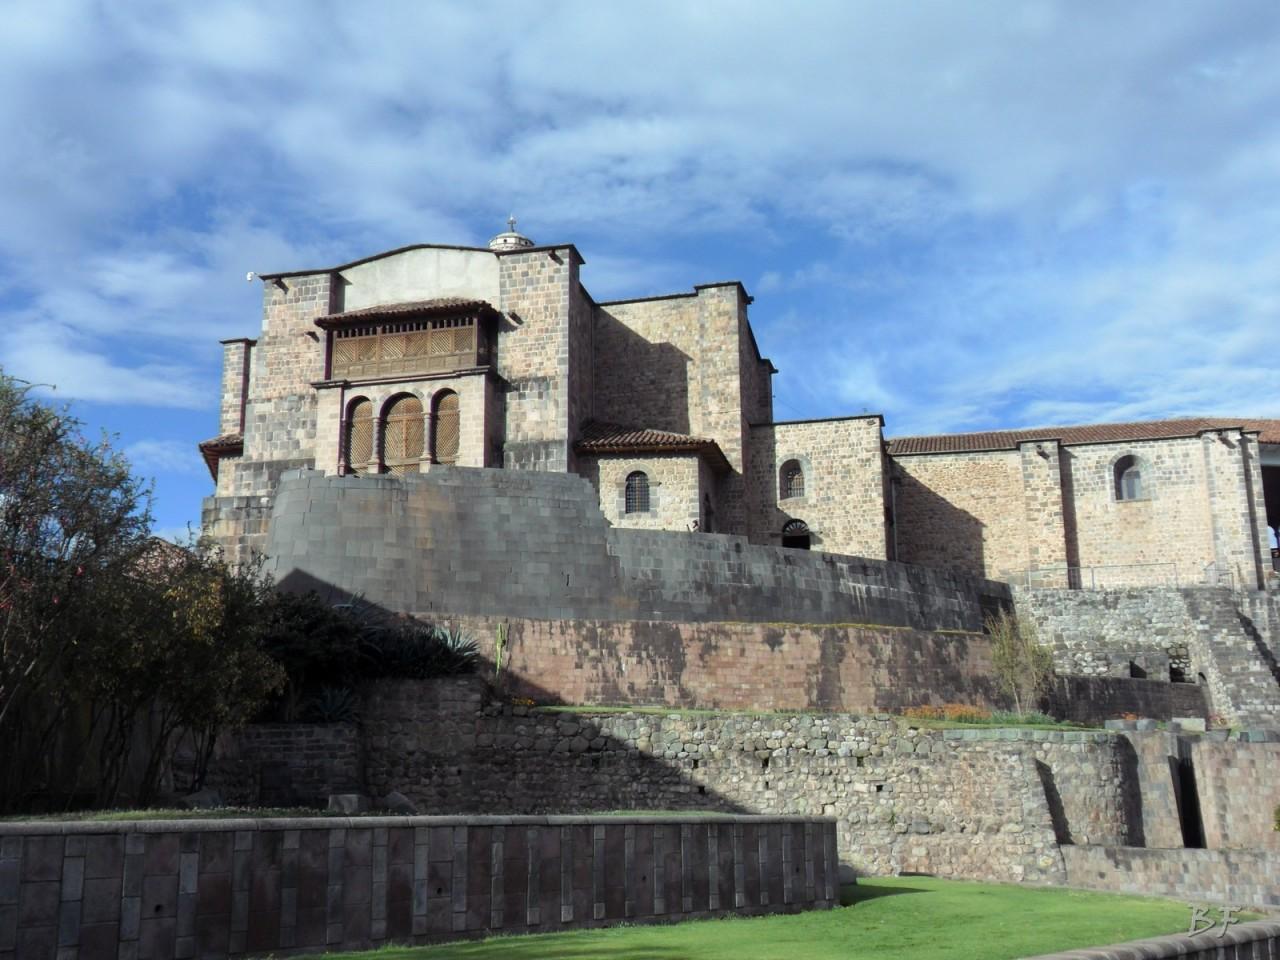 Mura-Poligonali-Megaliti-Tempio-Coricancha-Cusco-Perù-19